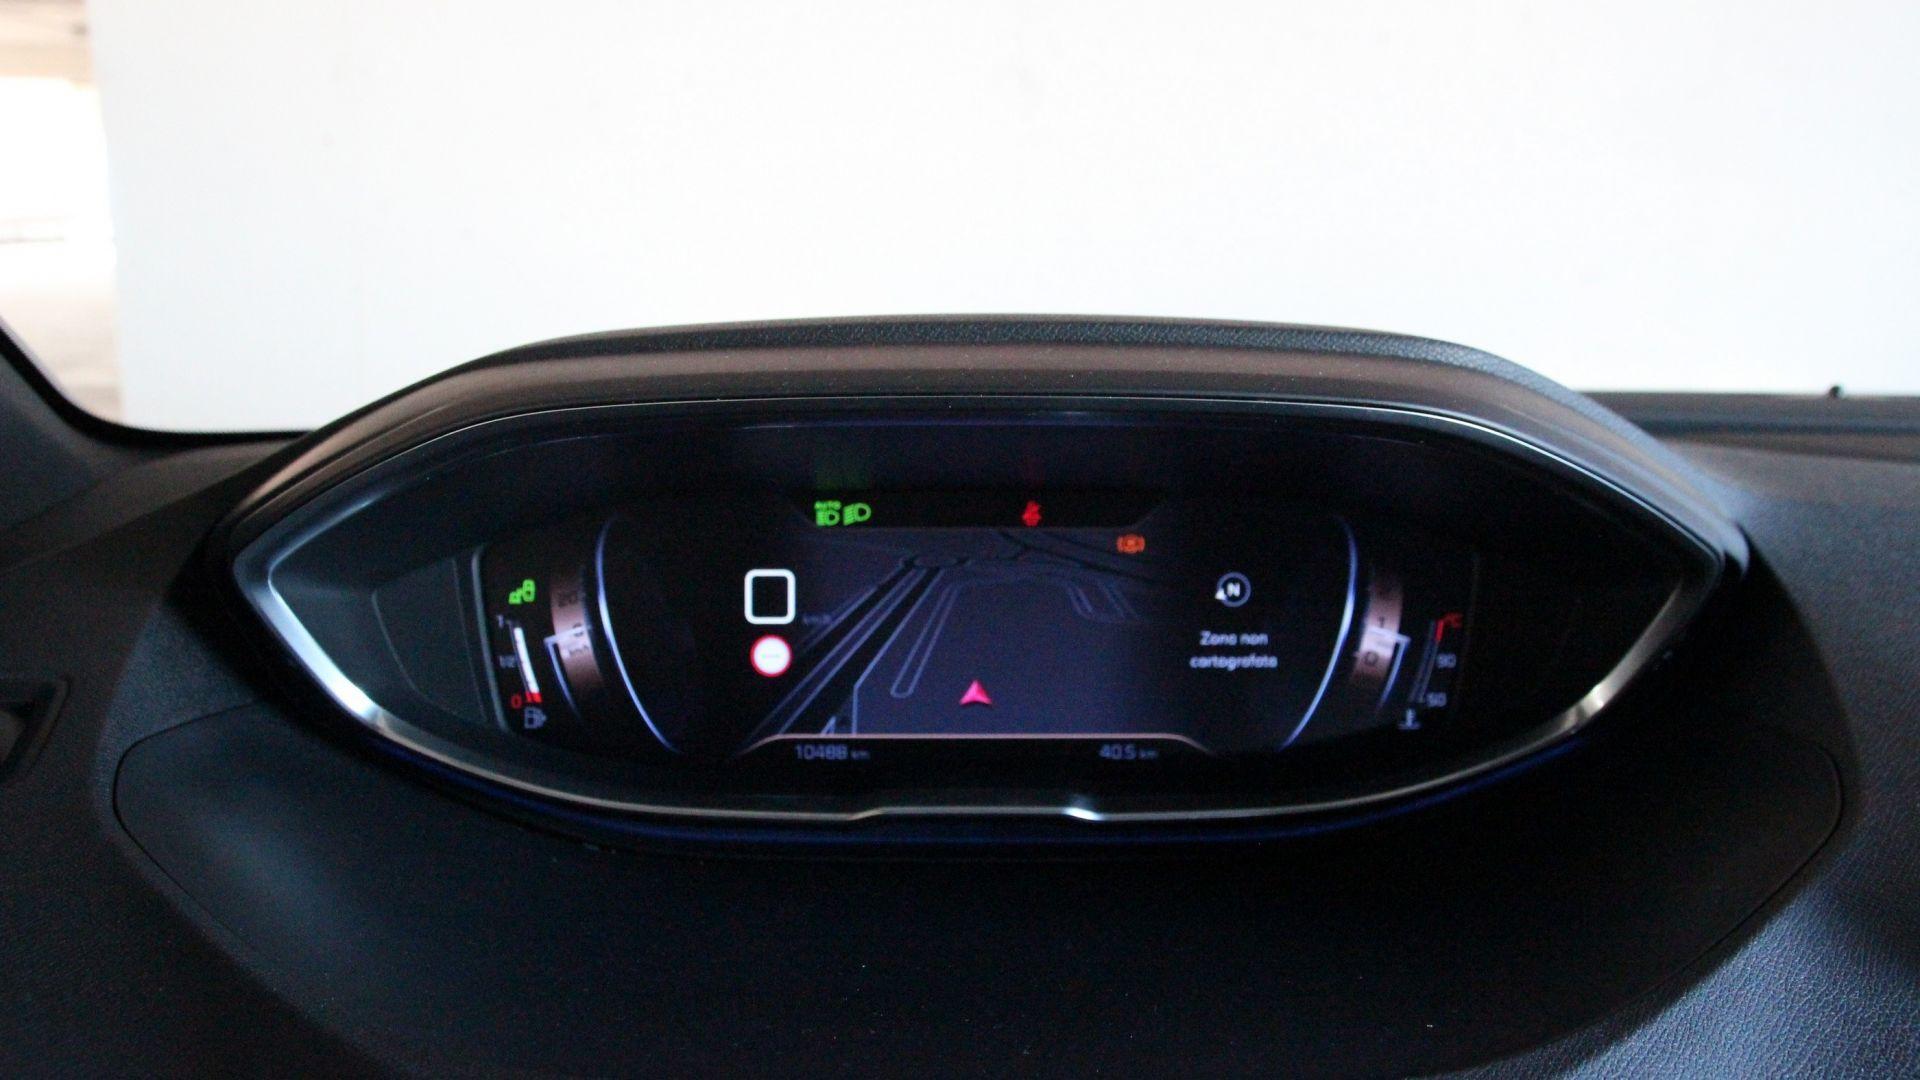 Peugeot 5008 Configuratore >> Peugeot 3008 12 Puretech Prova Su Strada | Autos Post